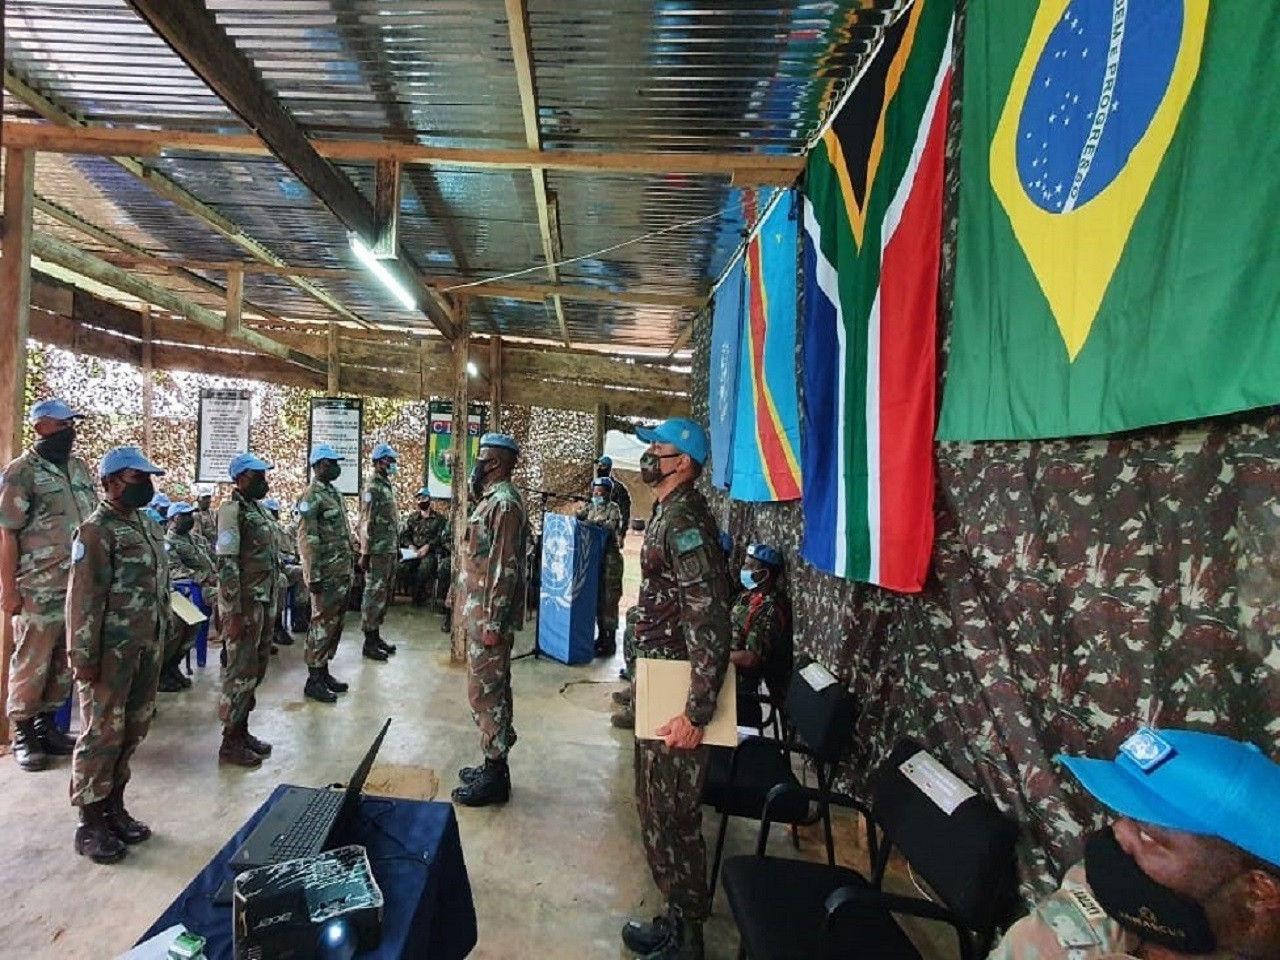 Exército Brasileiro realiza treinamento de selva para tropas da ONU no Congo